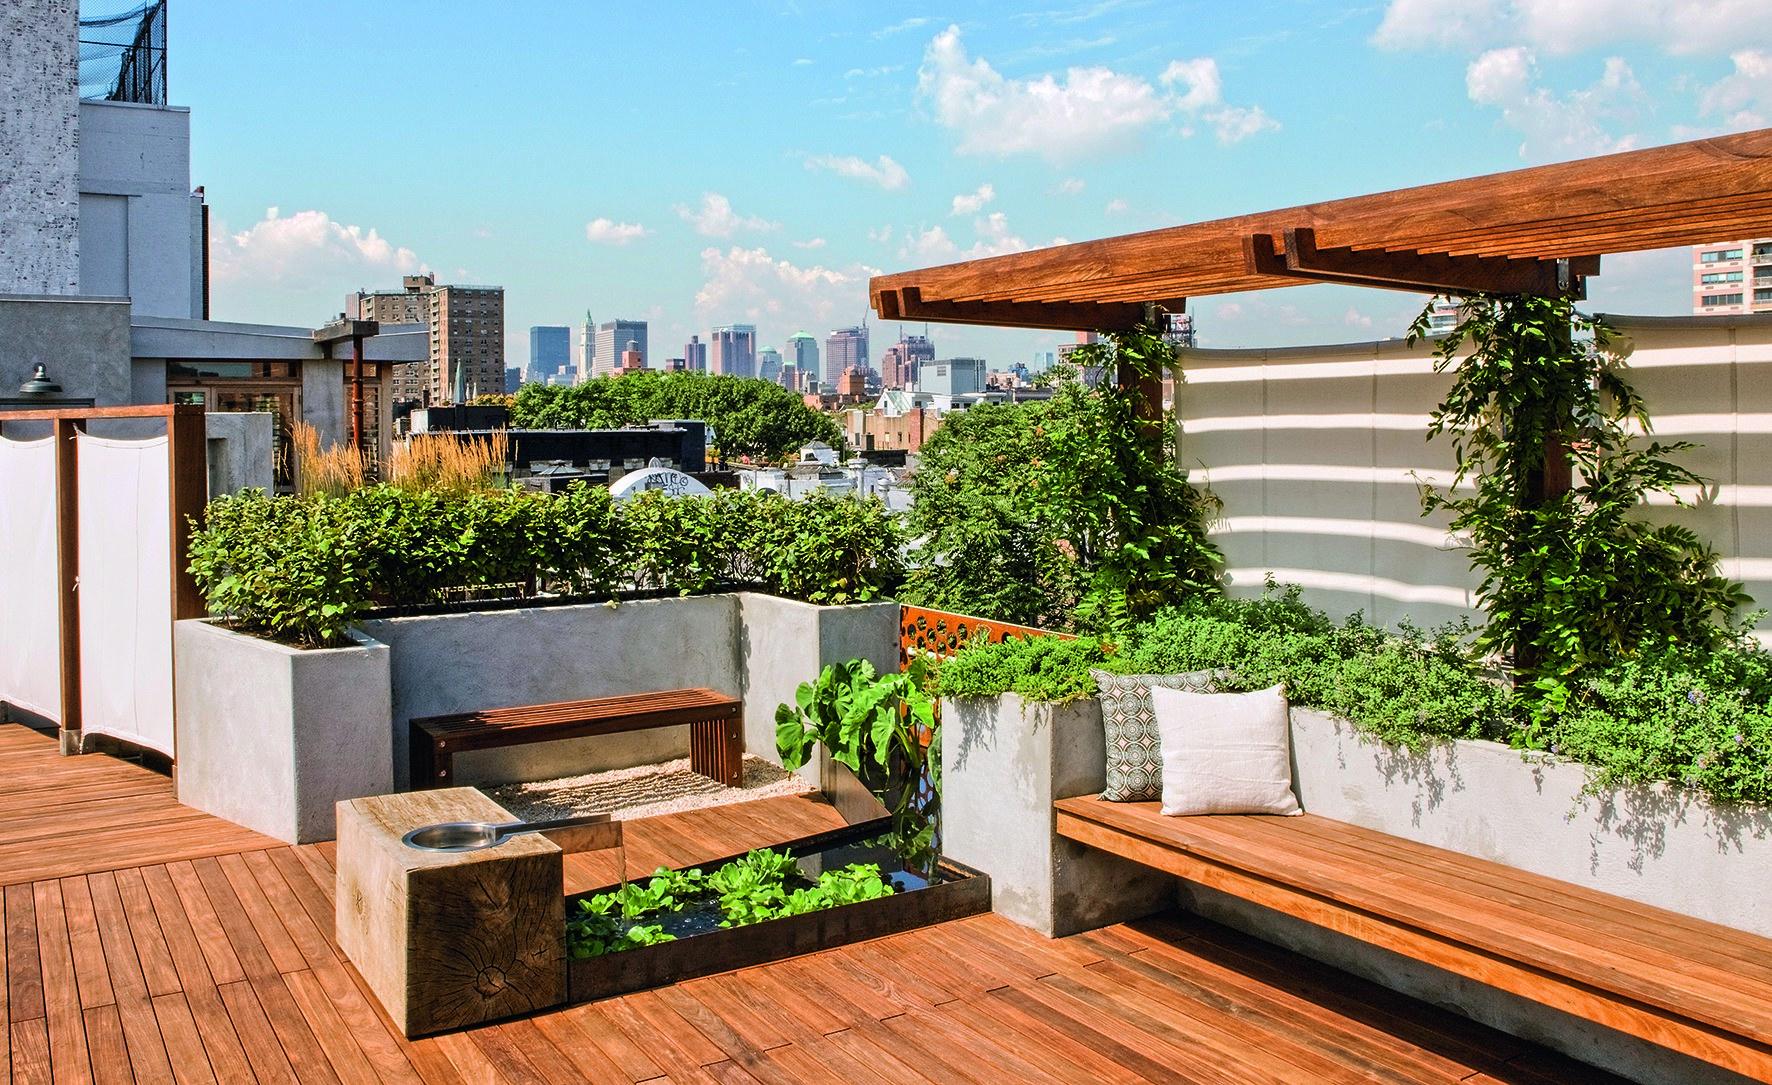 roof garden 9 remarkable rooftop garden designs around the world photos | architectural TZGYIJS